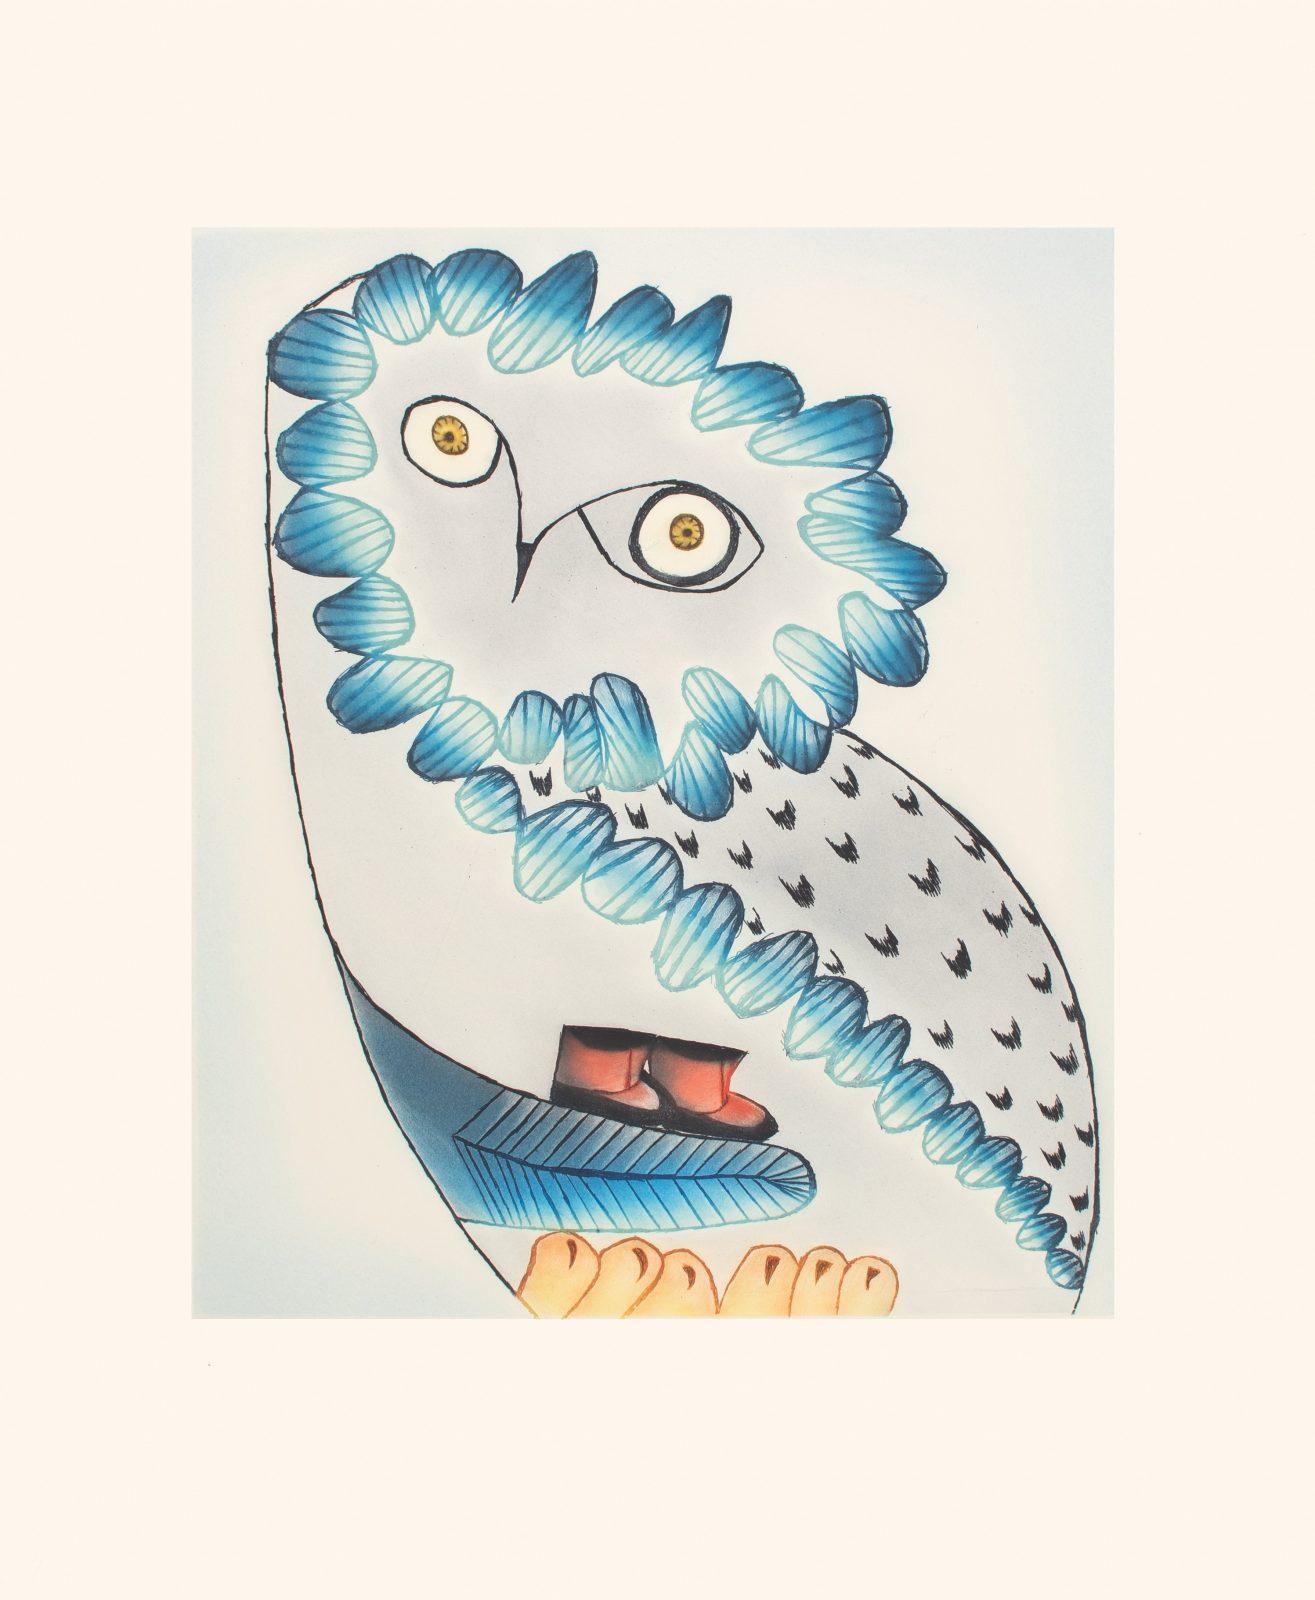 NINGIUKULU TEEVEE Owl's Bequest Cape Dorset Print 2021